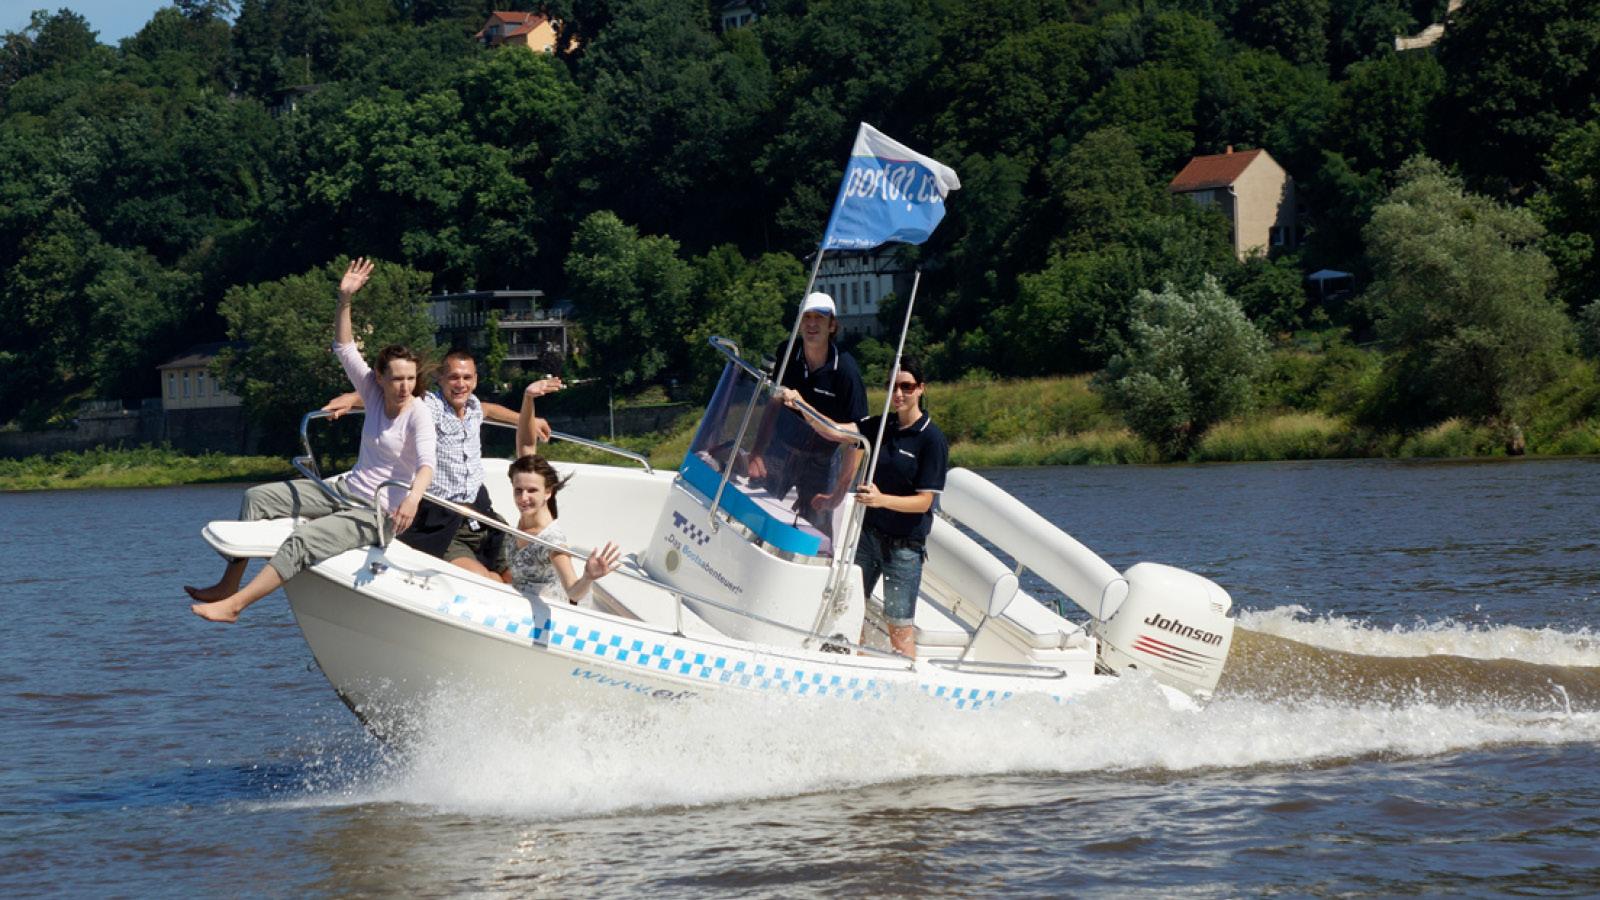 Speedboot Tour in Dresden - Blaues Wunder - Erlebnisfabrik